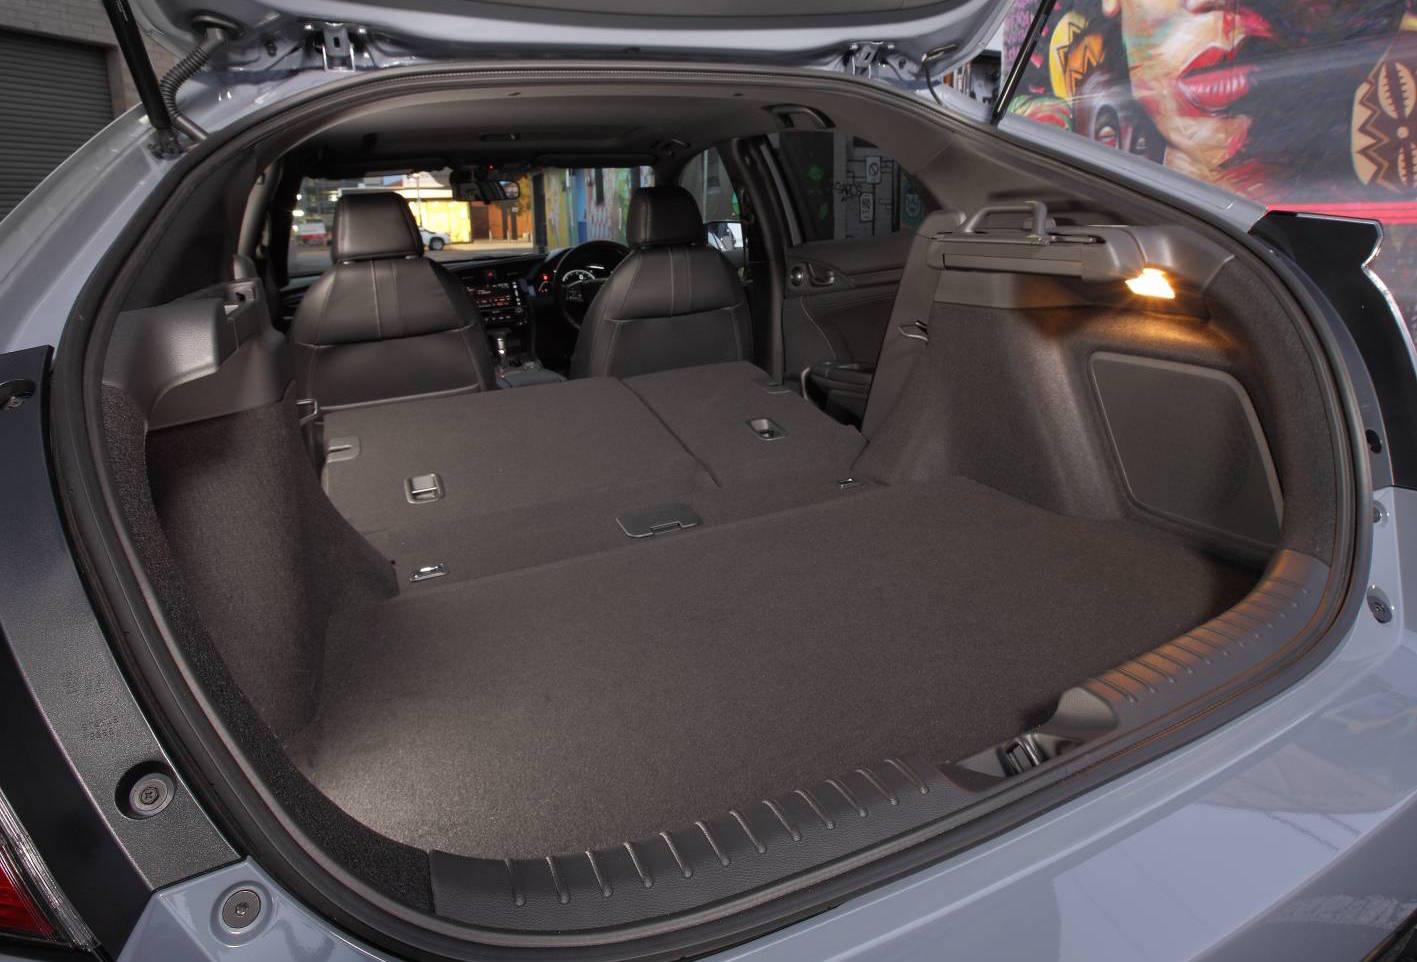 2017 honda civic hatch now on sale in australia performancedrive. Black Bedroom Furniture Sets. Home Design Ideas